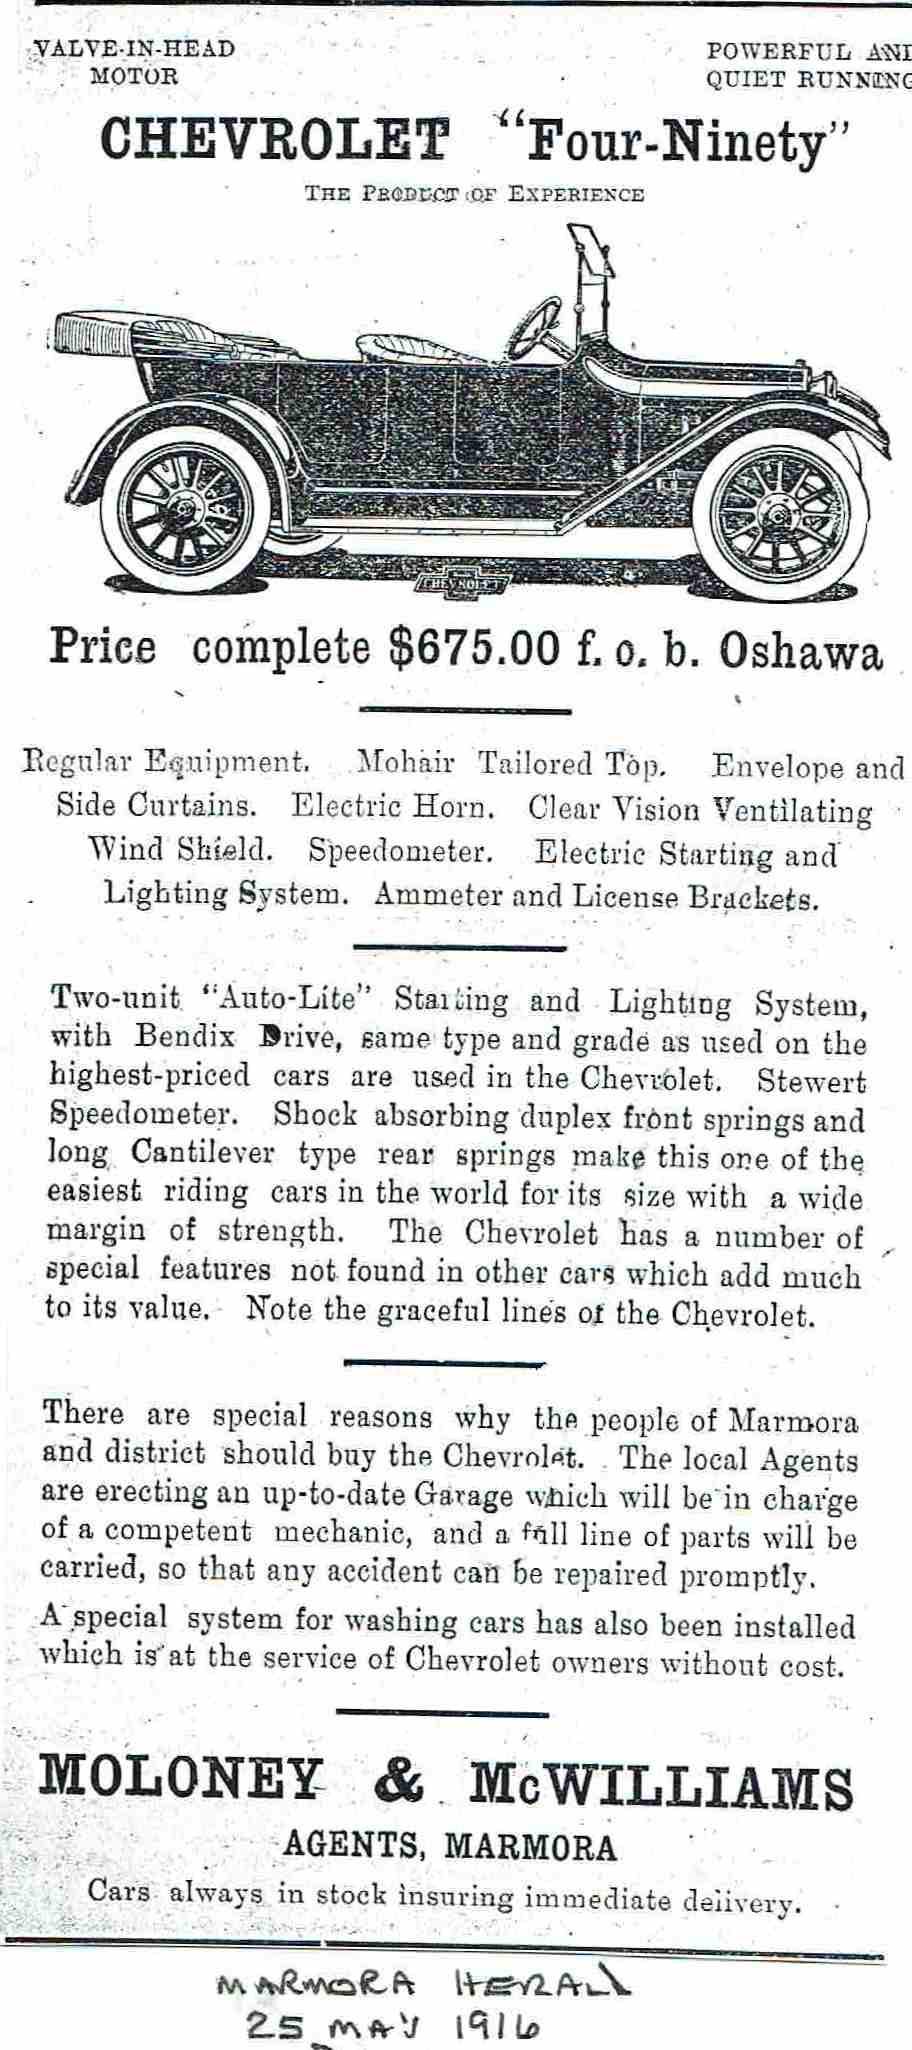 1916 Moloney McWilliams.JPG